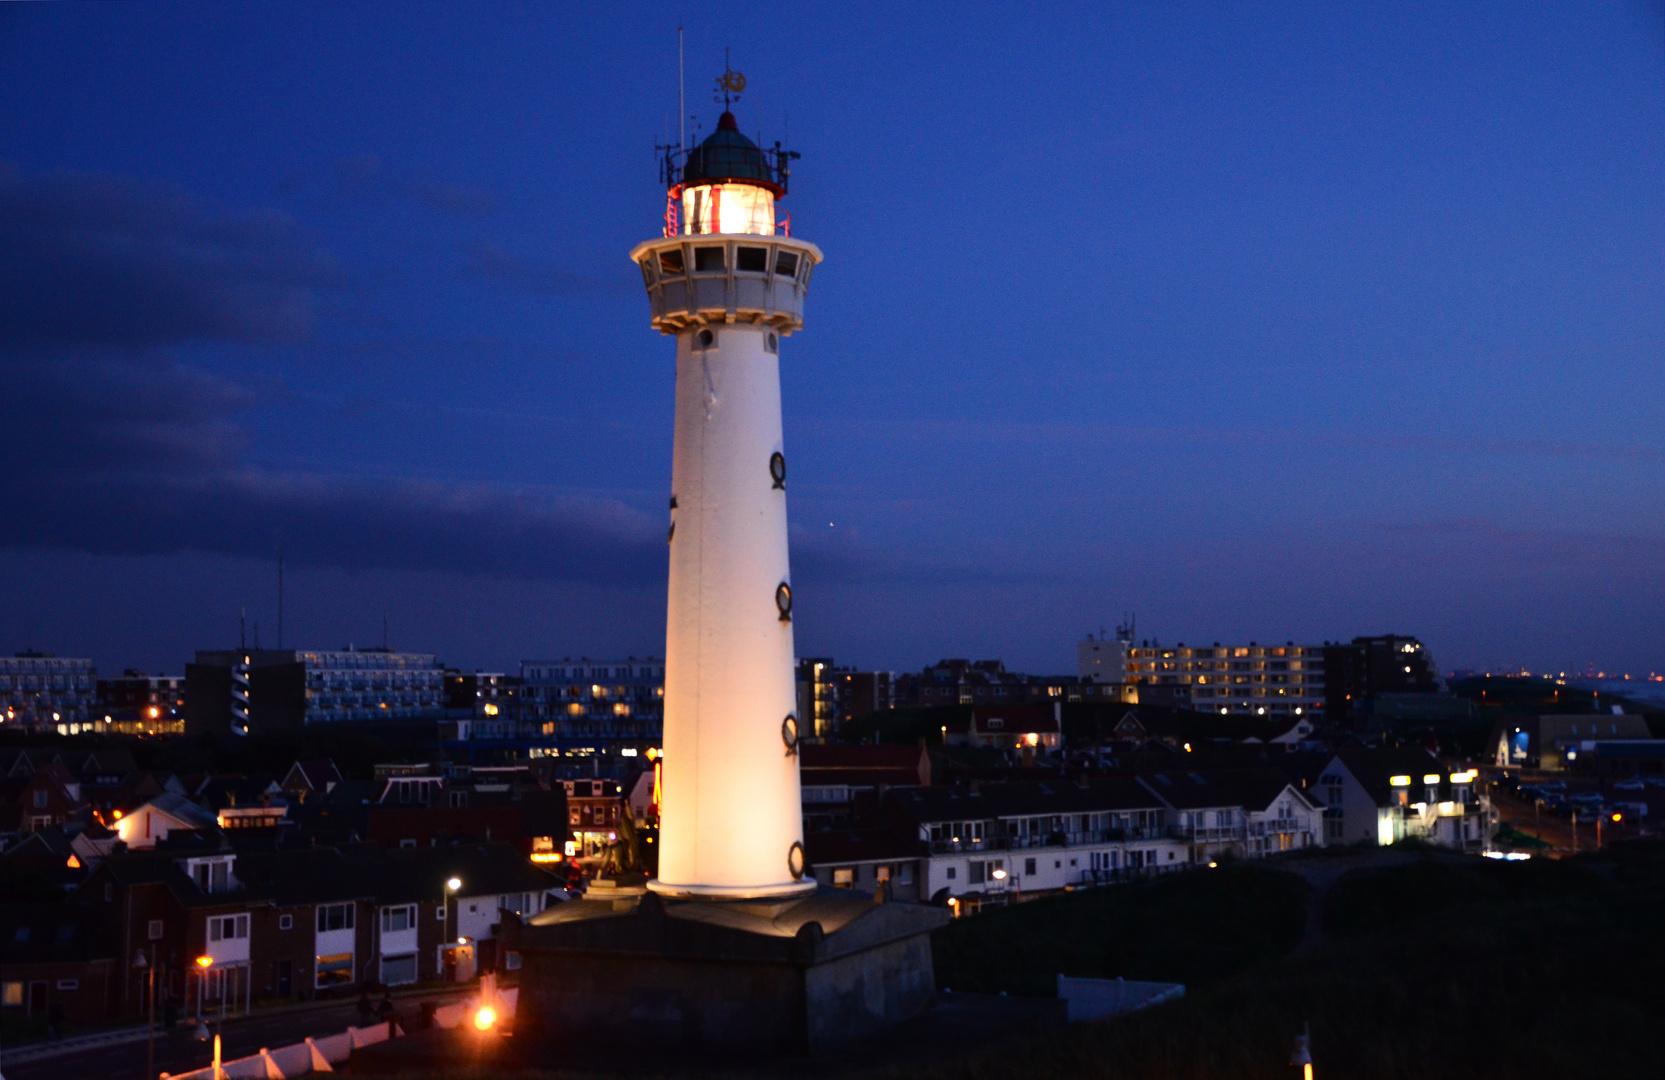 Der Leuchtturm von Egmond aan Zee - Vuurtoren Jan van Speijk